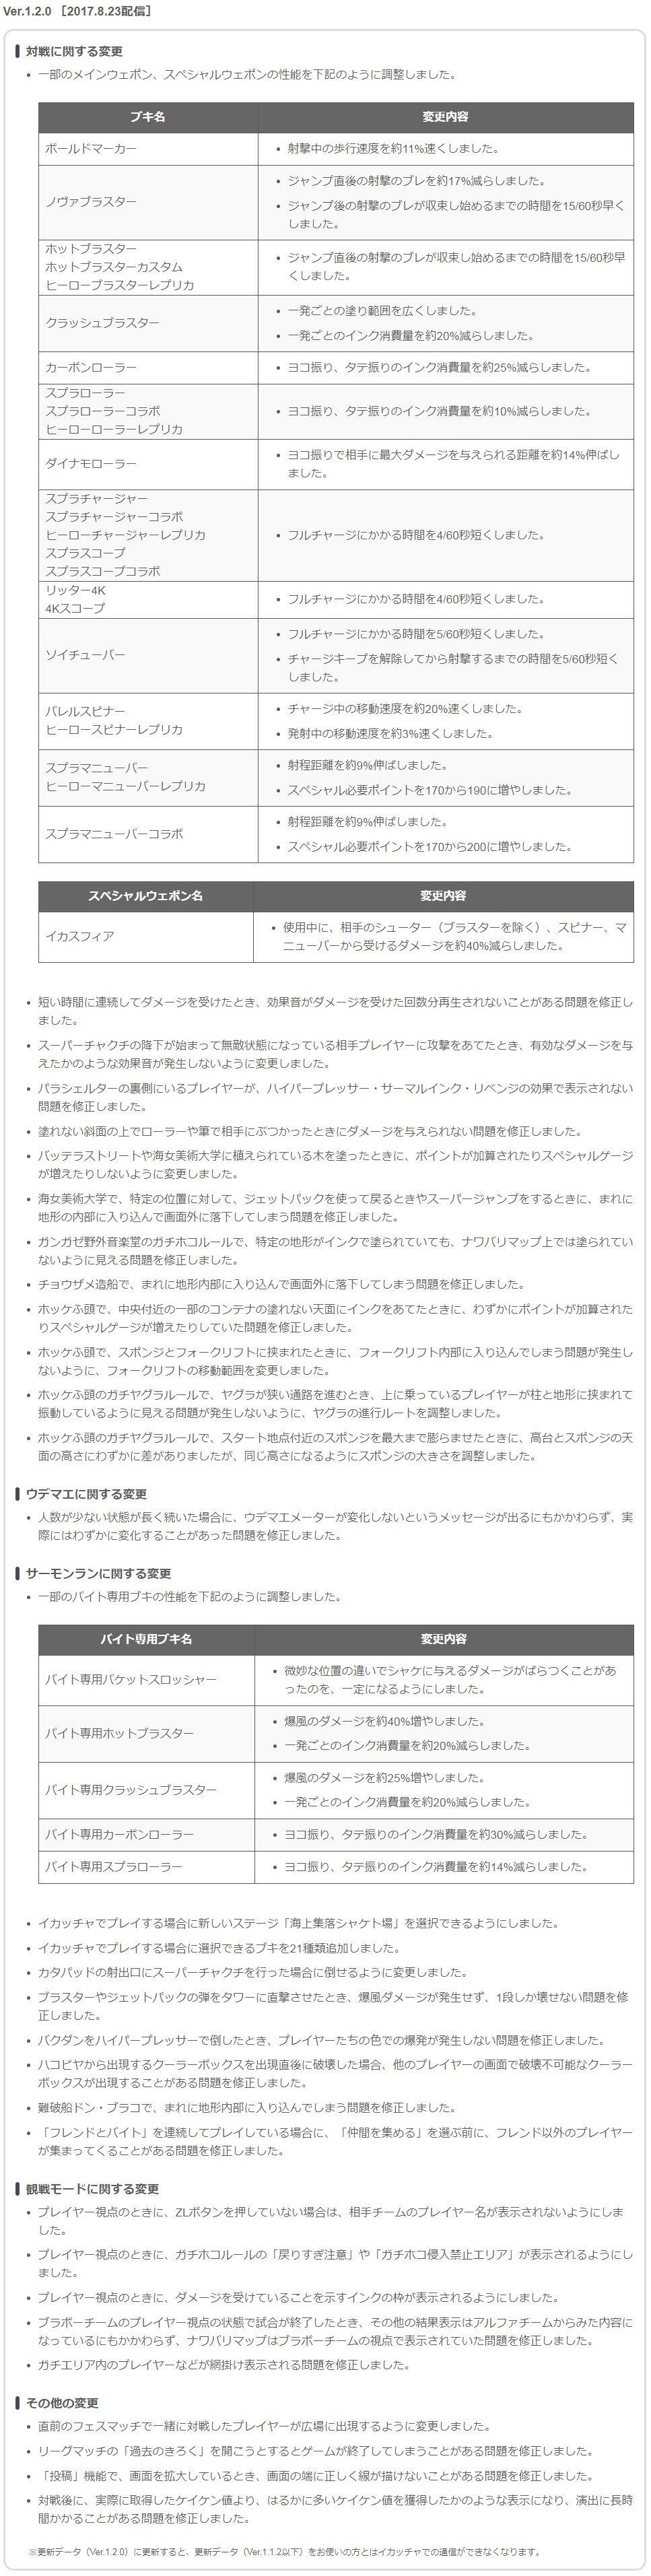 image_10001.jpg